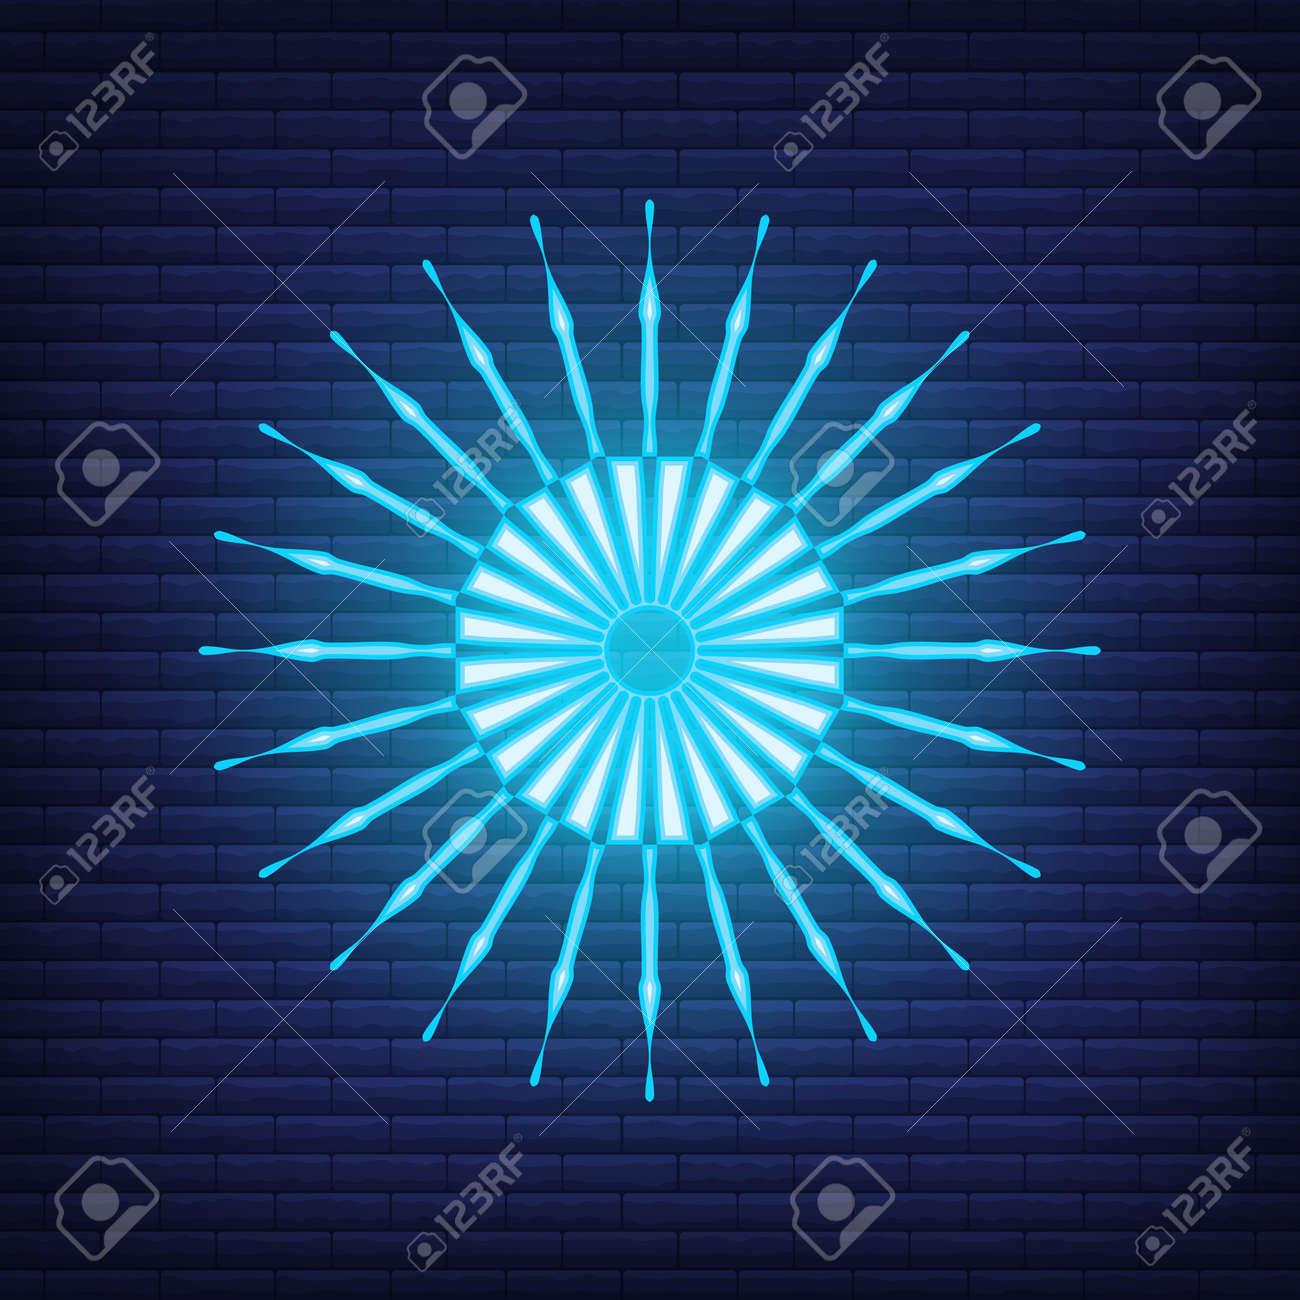 Retro design light sunburst neon style glow geometric shape, vintage rays sunlight explosion icon concept vector illustration, isolated on black wall. Minimal blue firework burst label, sunbeam badge. - 168394798